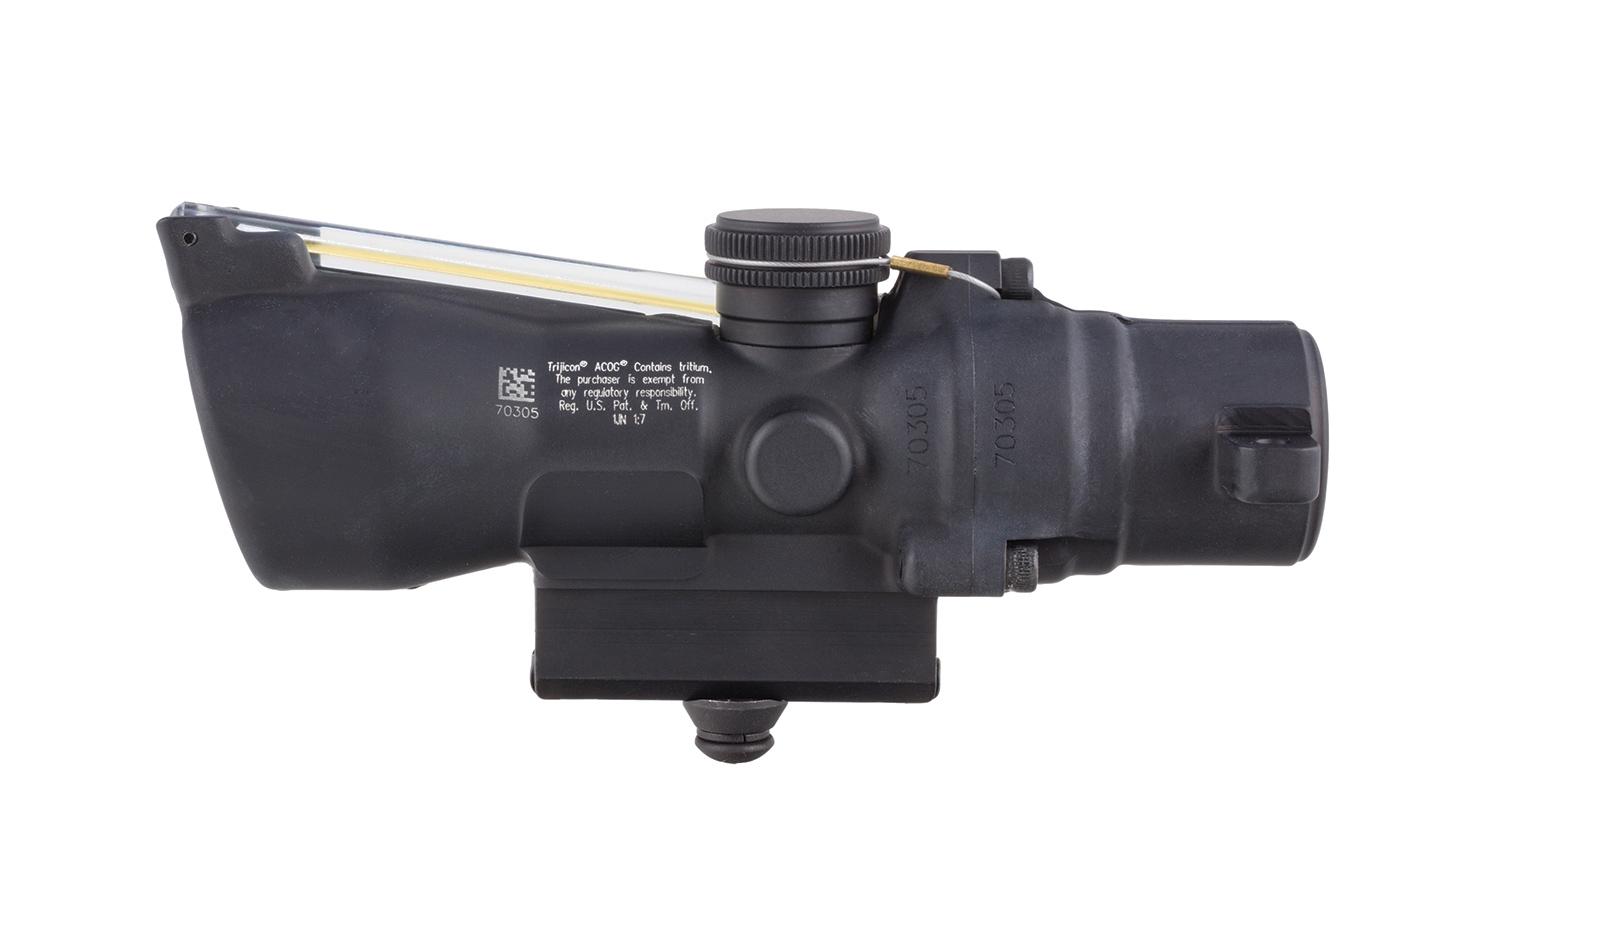 TA50-C-400227 angle 2